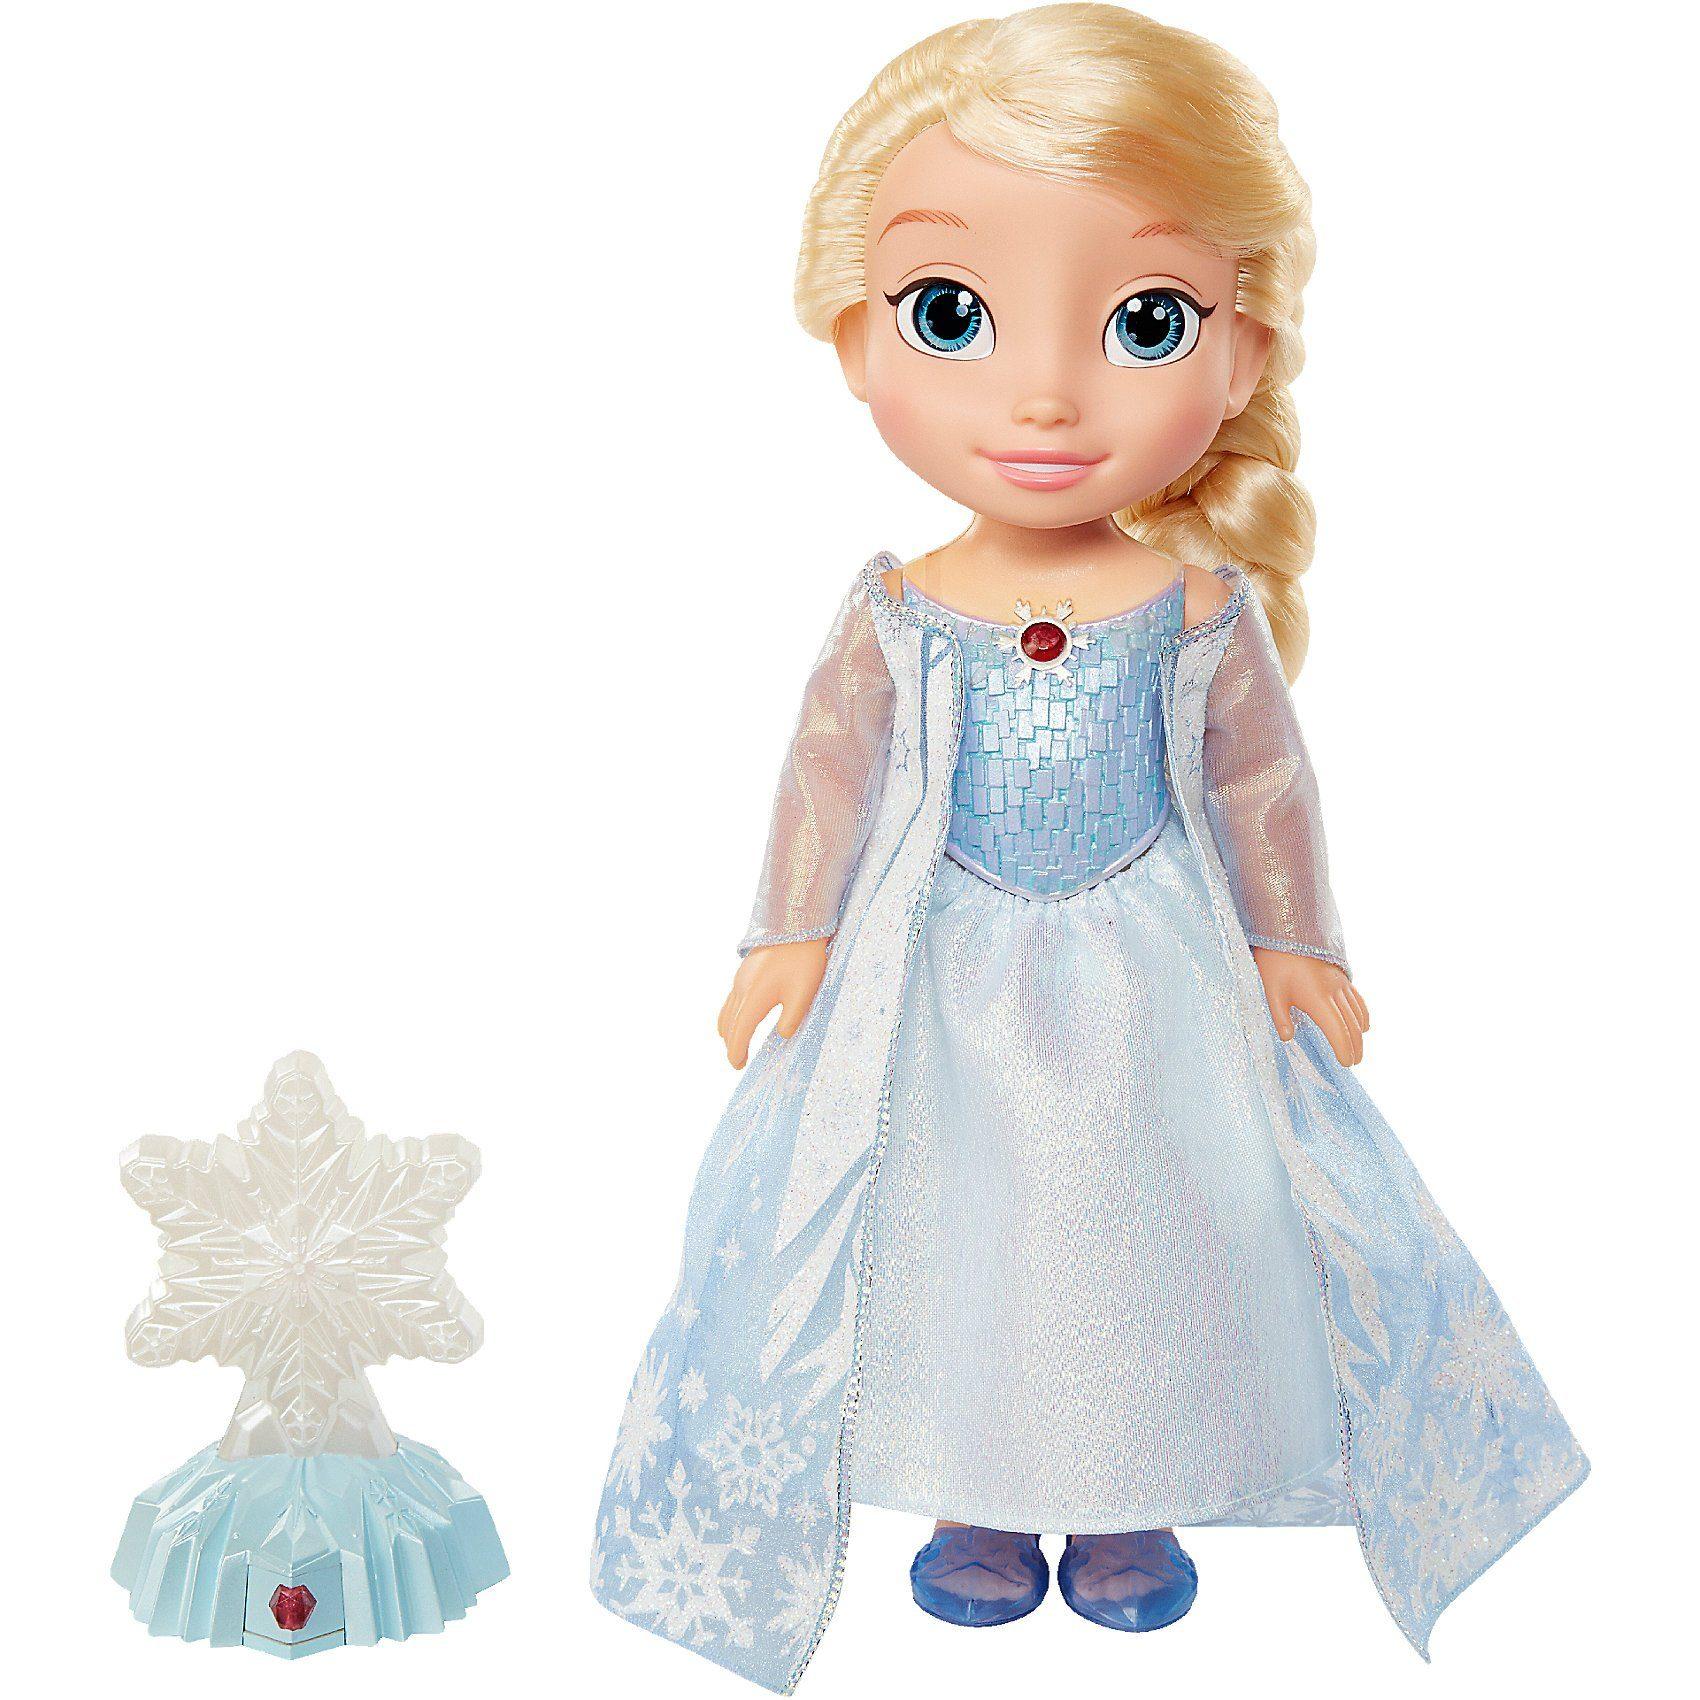 Jakks Pacific Disney Frozen Puppe Elsa Northern Lights 35 cm